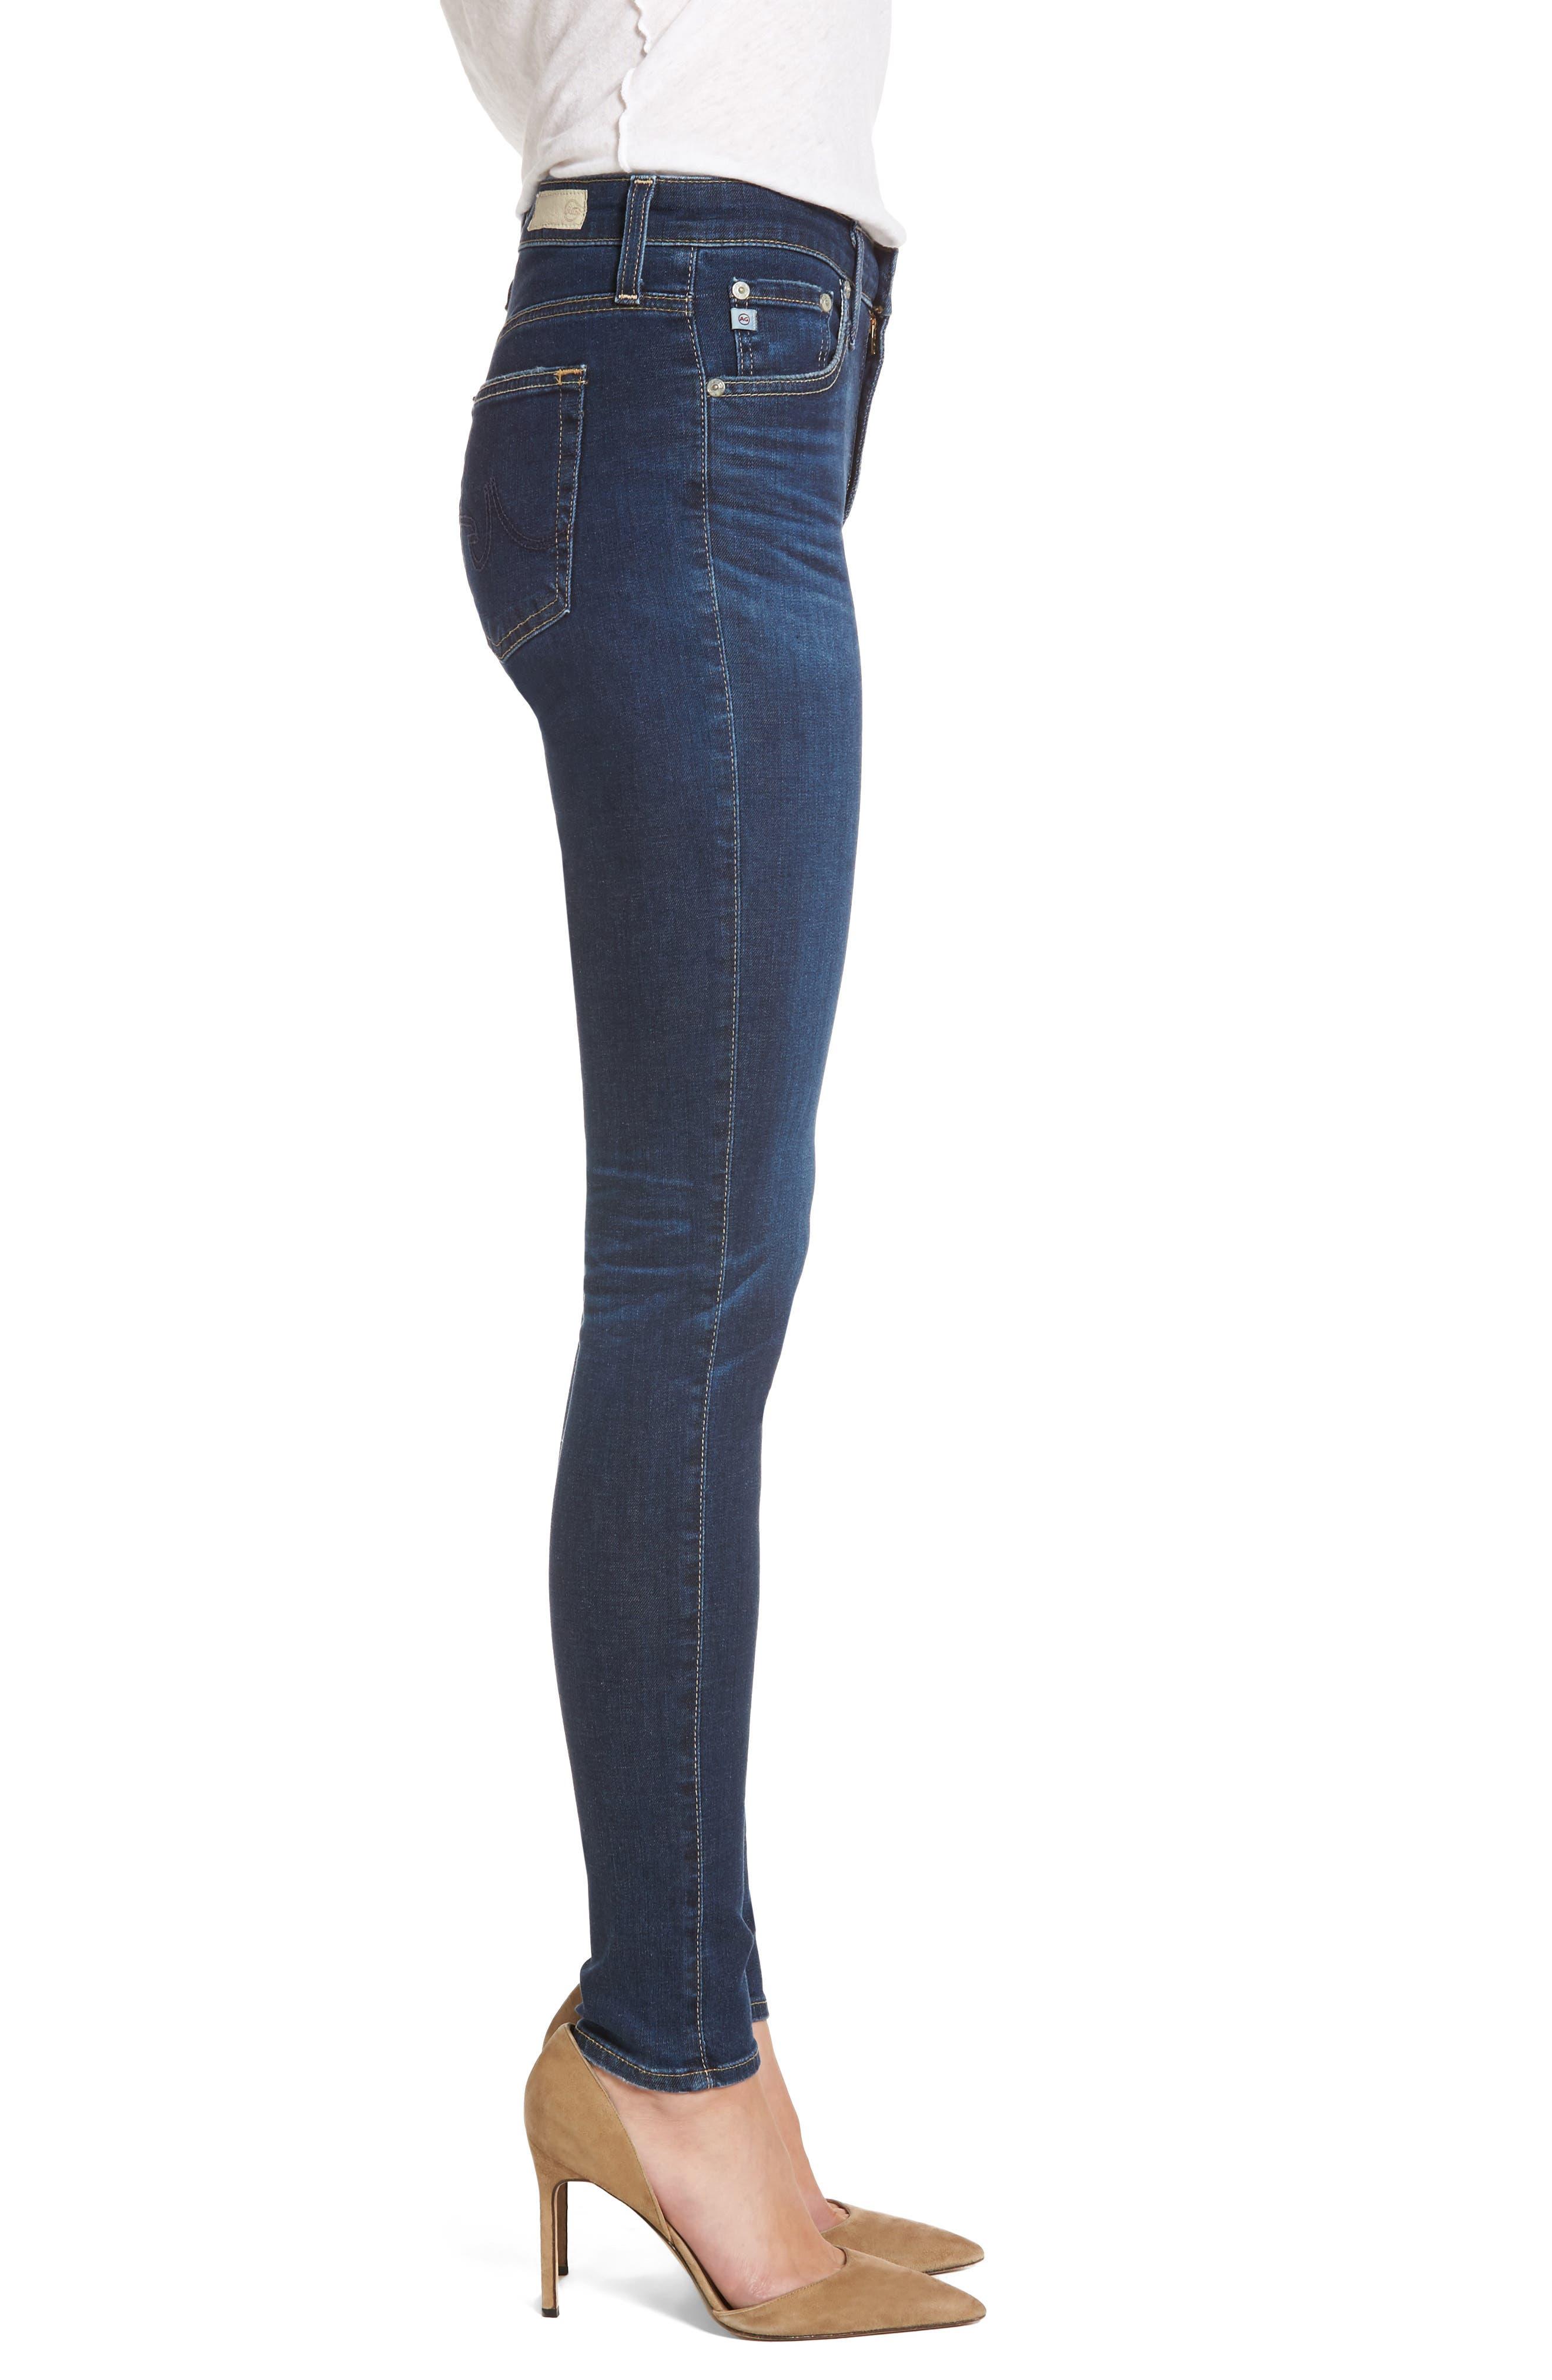 'The Farrah' High Rise Skinny Jeans,                             Alternate thumbnail 26, color,